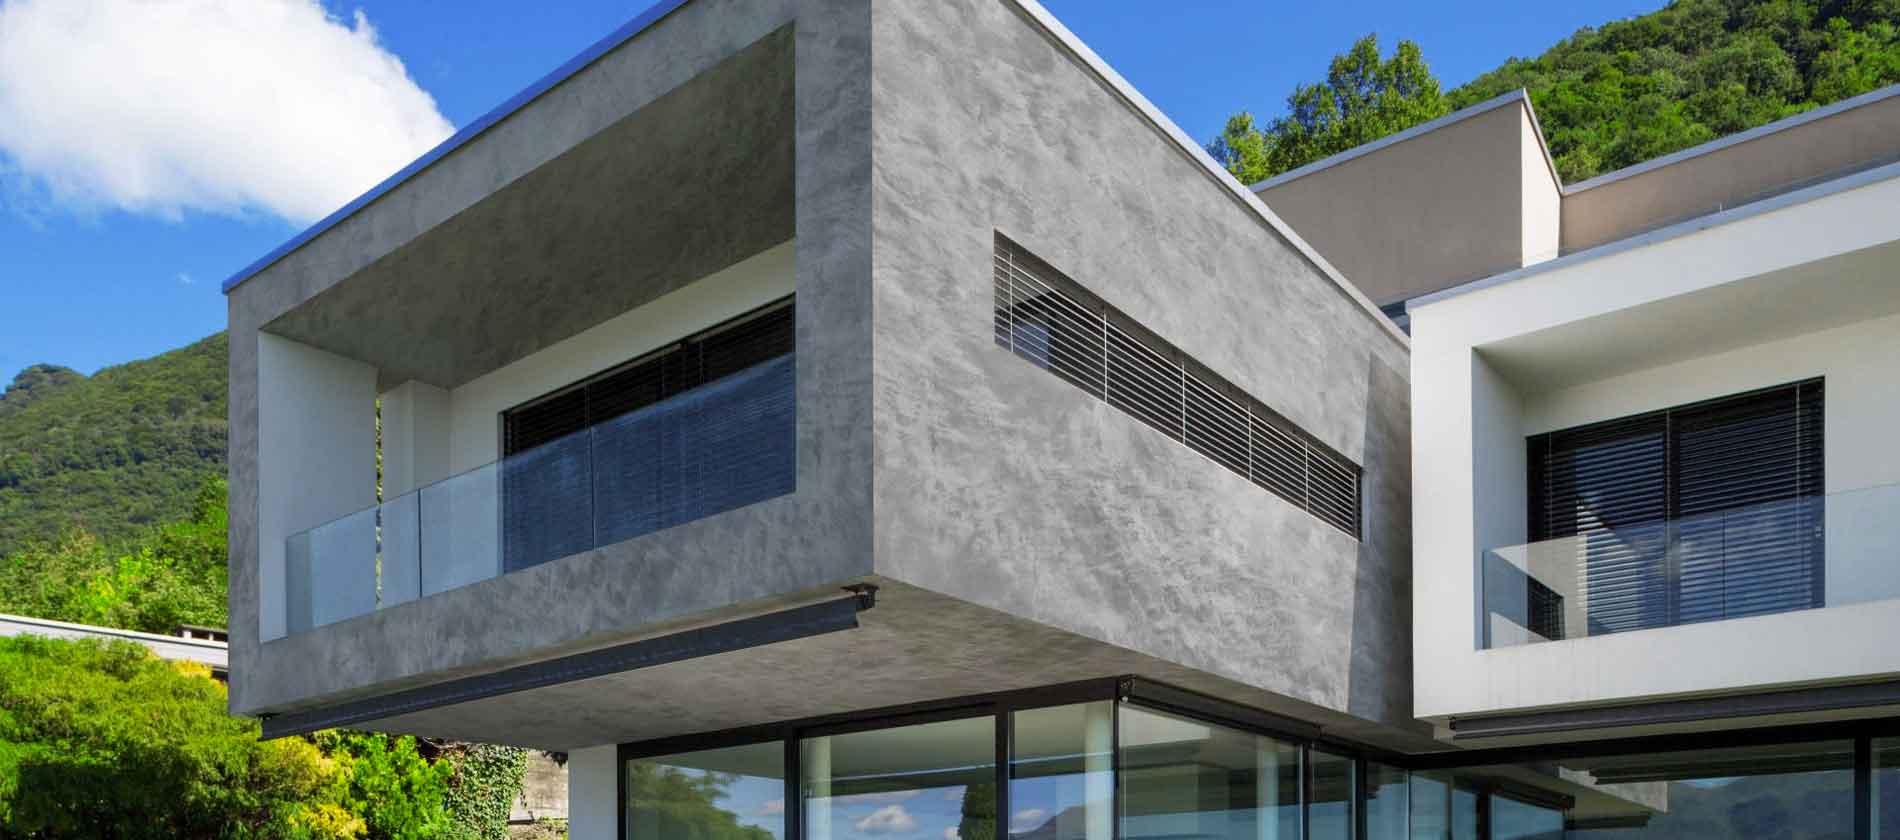 MONOKRETE Exterior Texture Paint